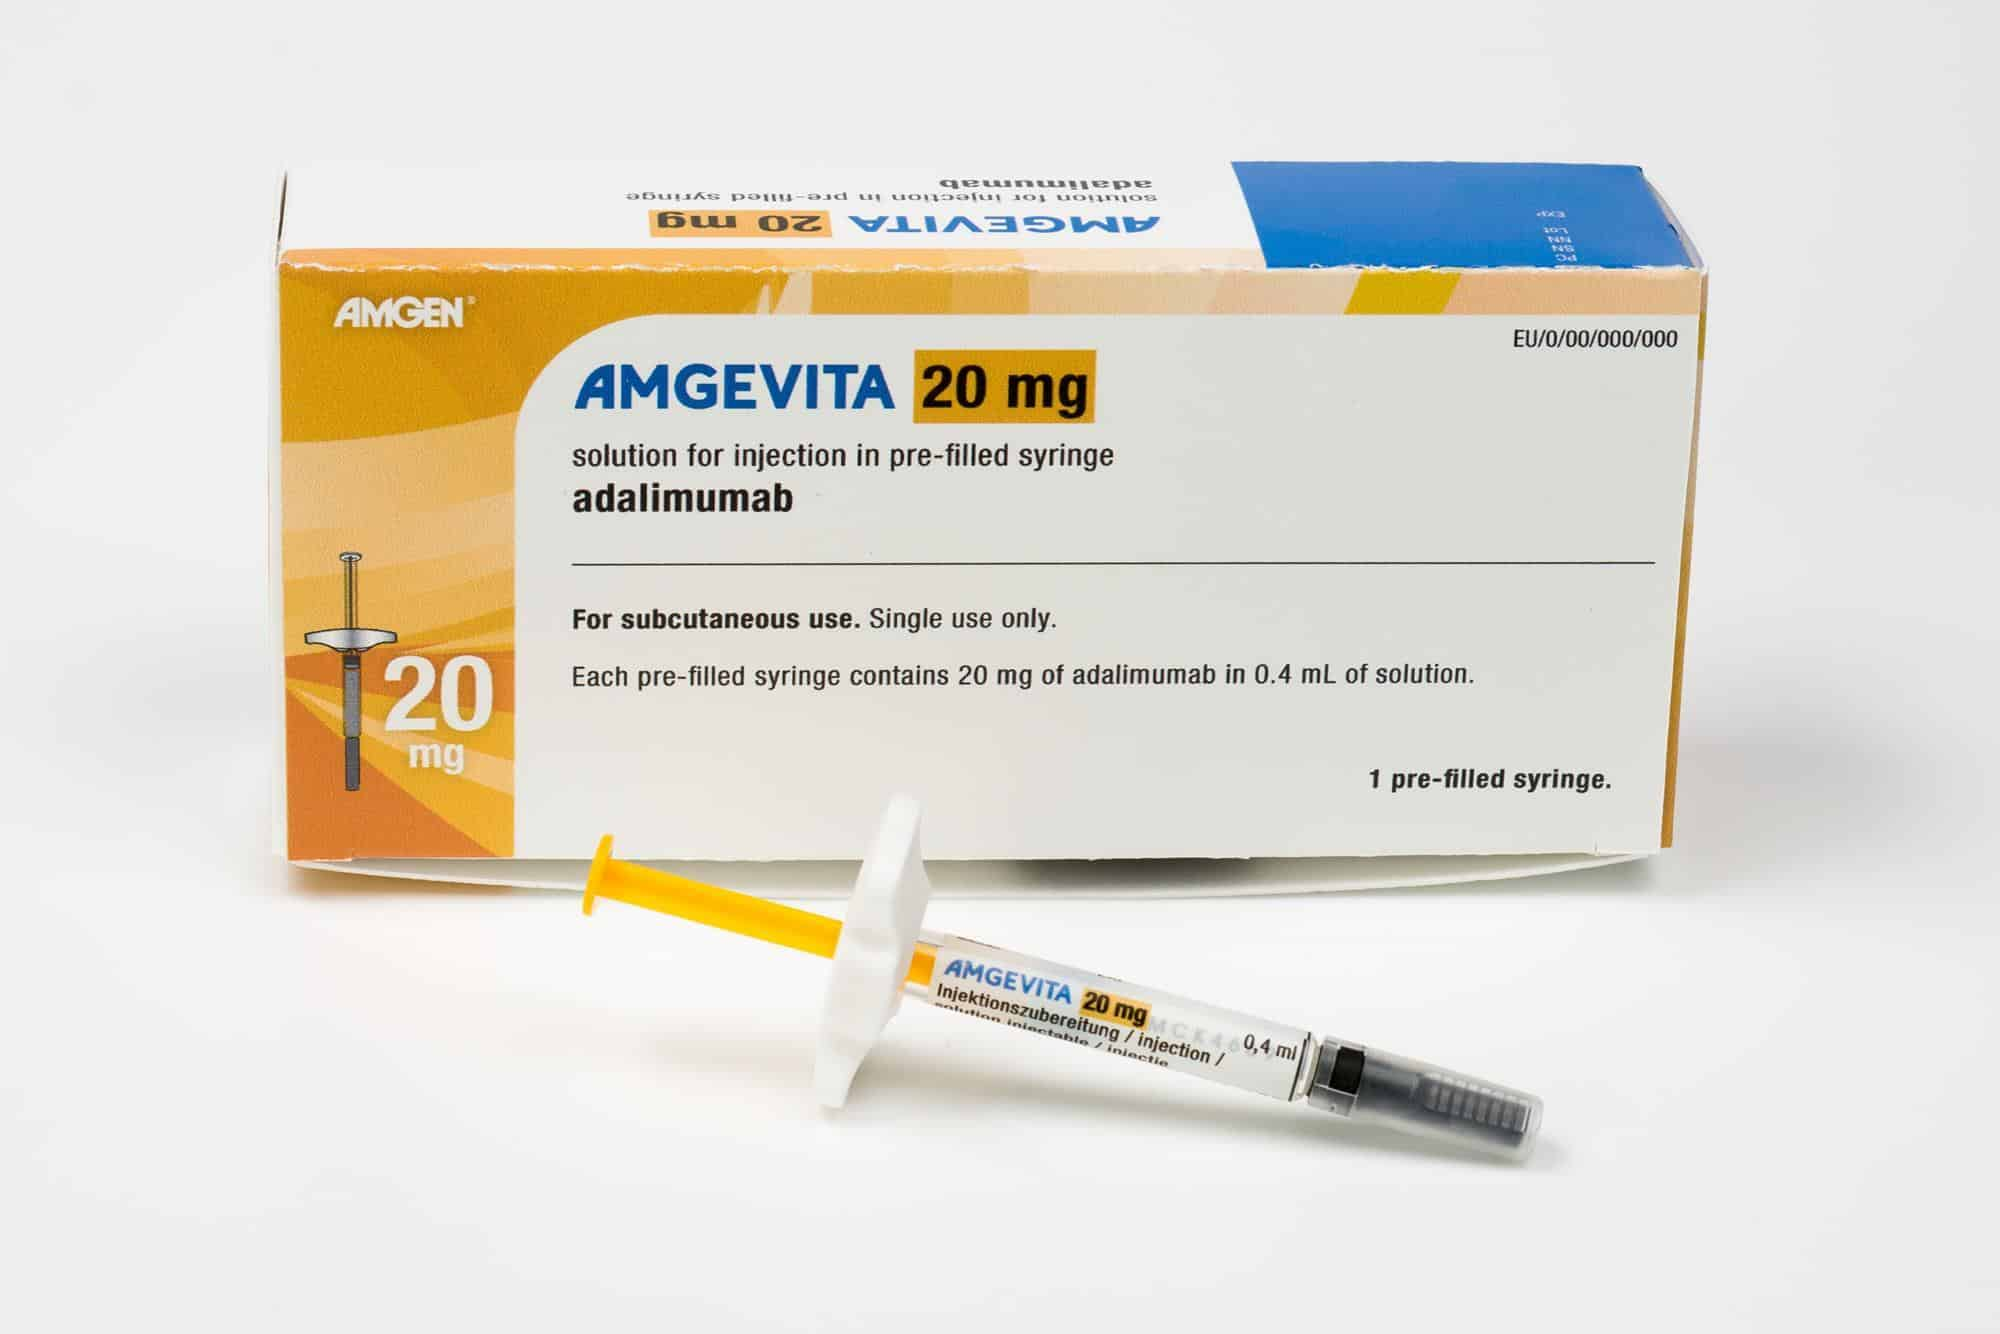 amgevita Dosage